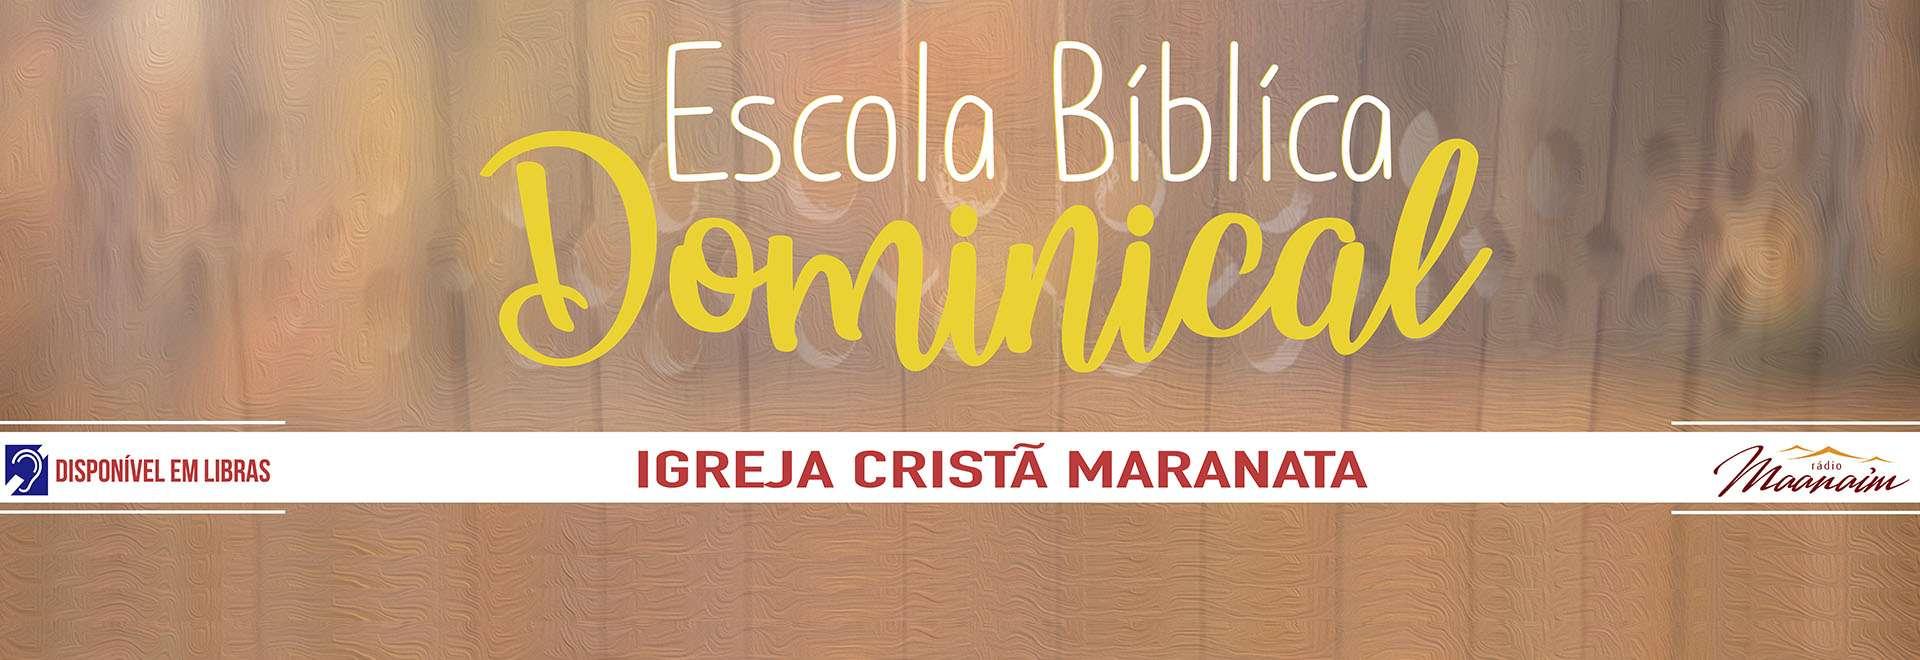 Participações da EBD da Igreja Cristã Maranata - 27/09/2020